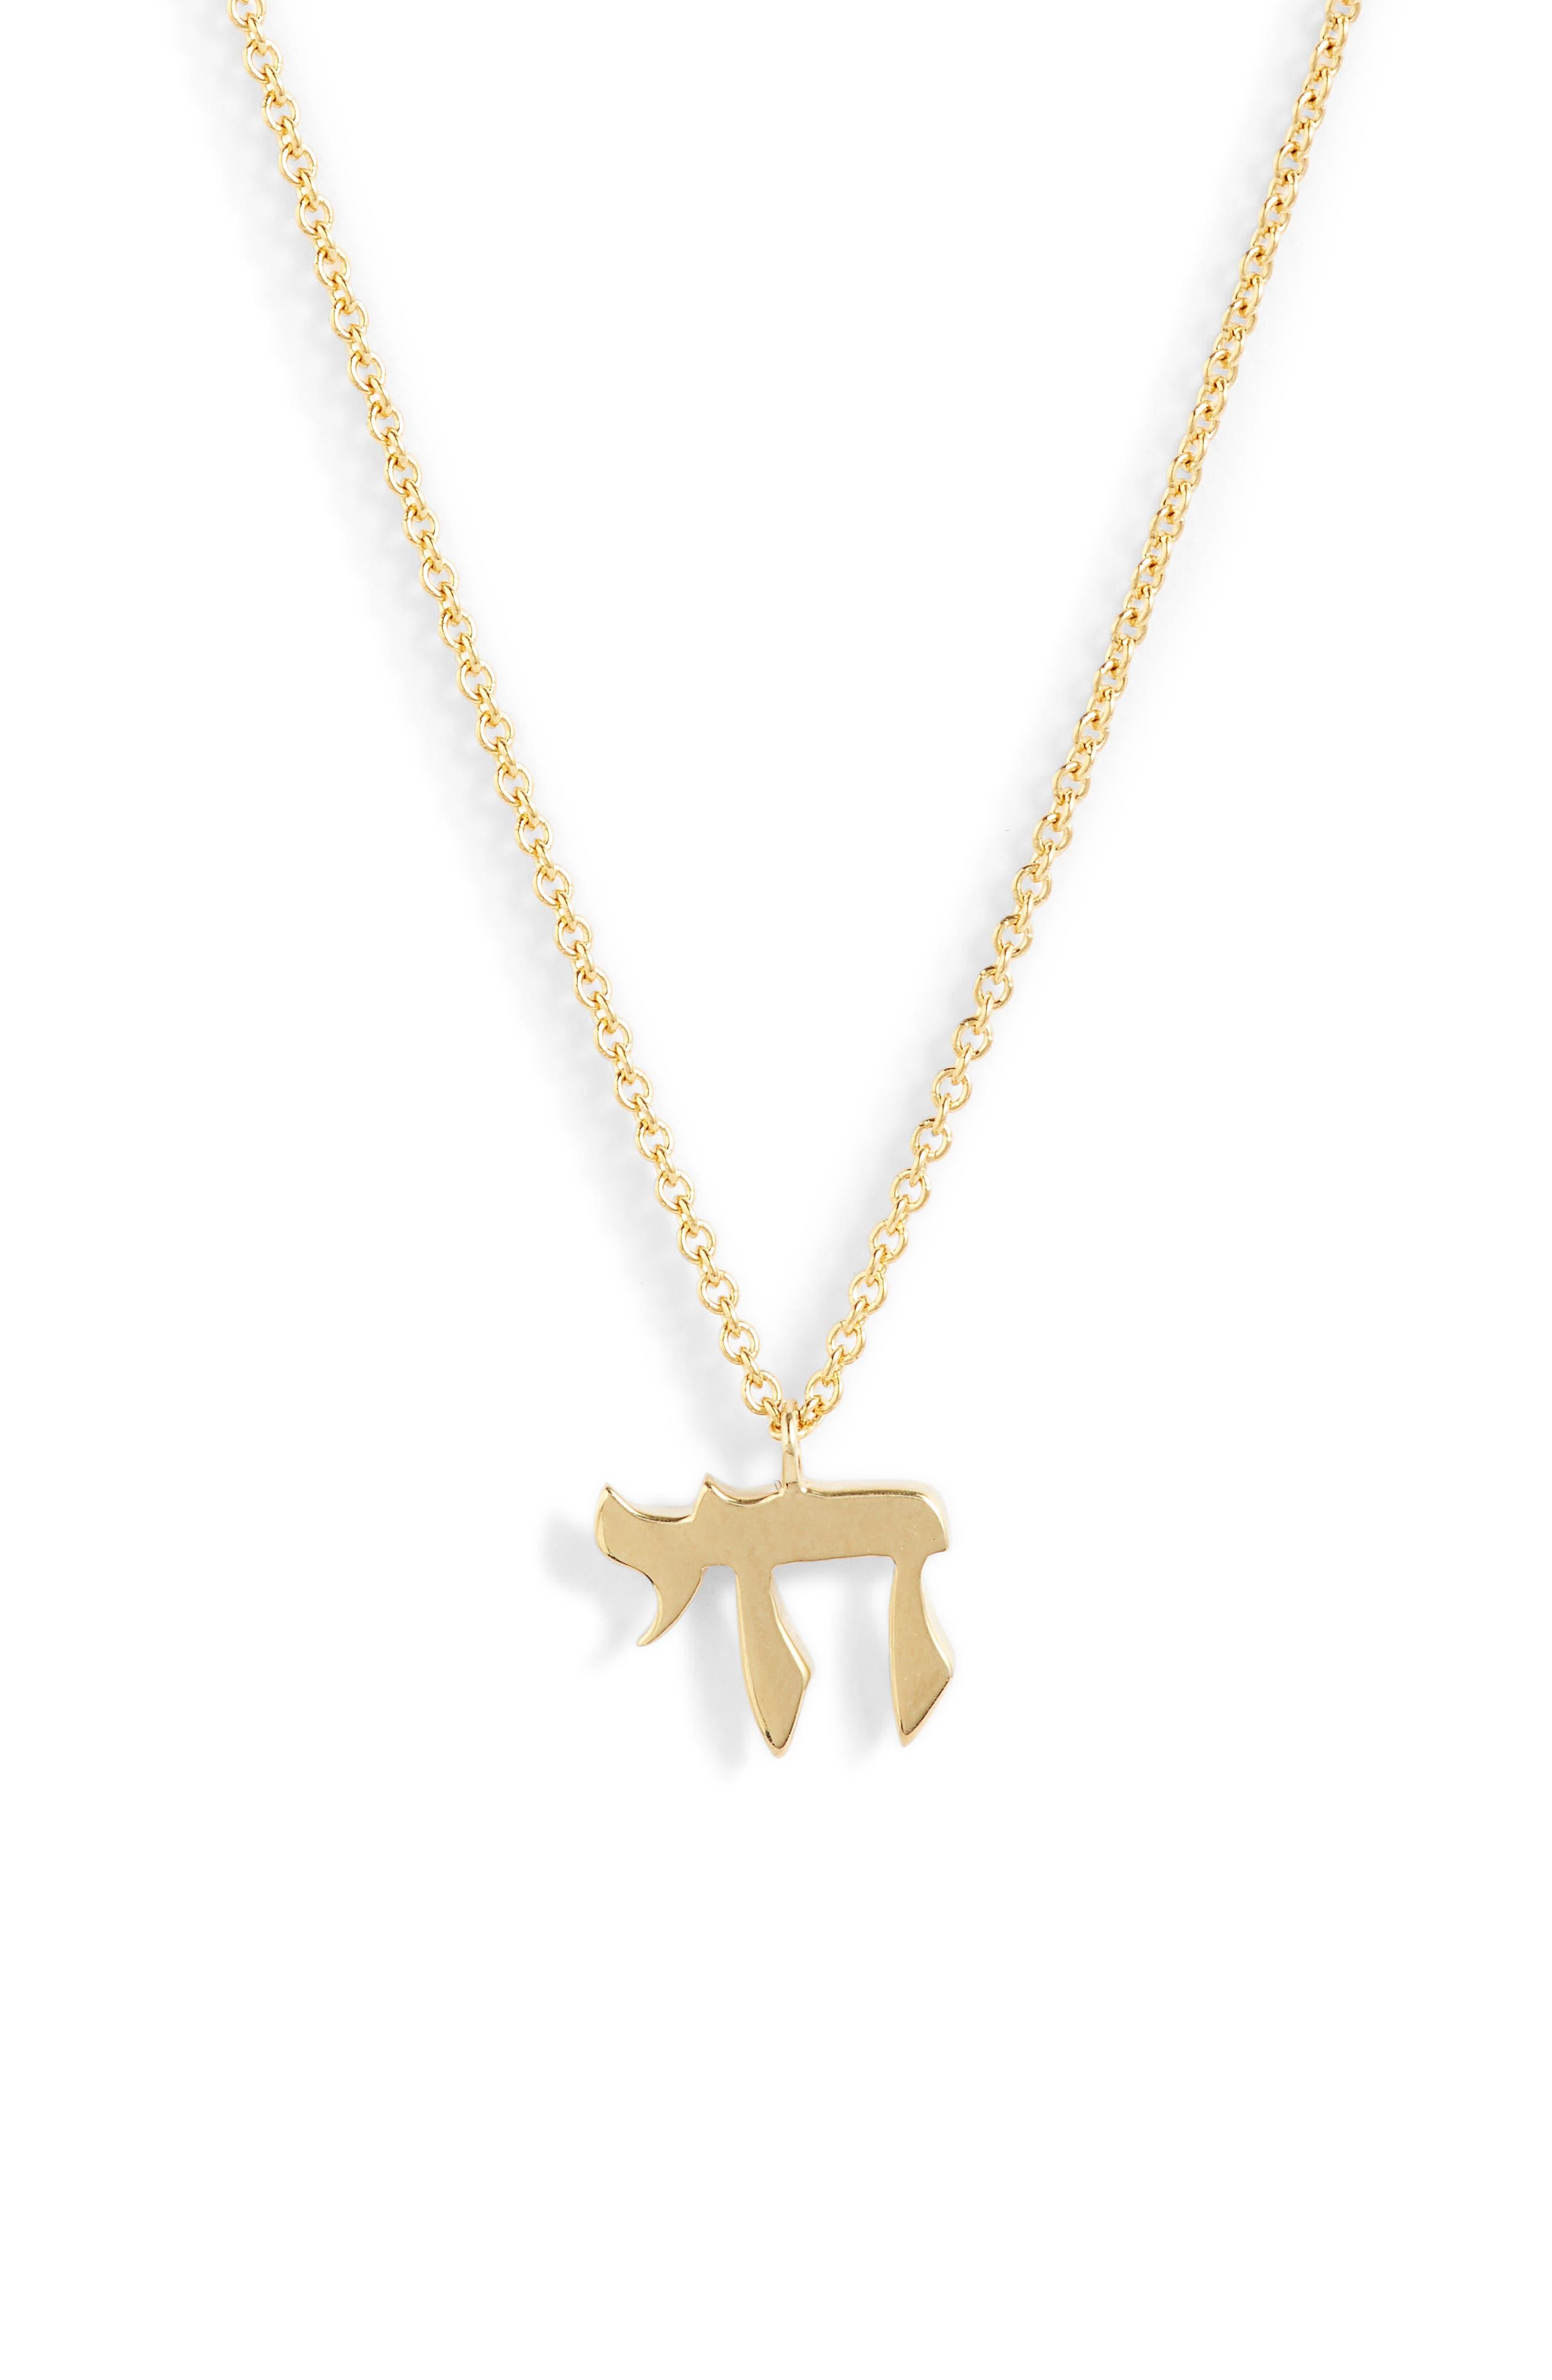 14K Gold Pendant Necklace,                             Main thumbnail 1, color,                             YELLOW GOLD/ DIA